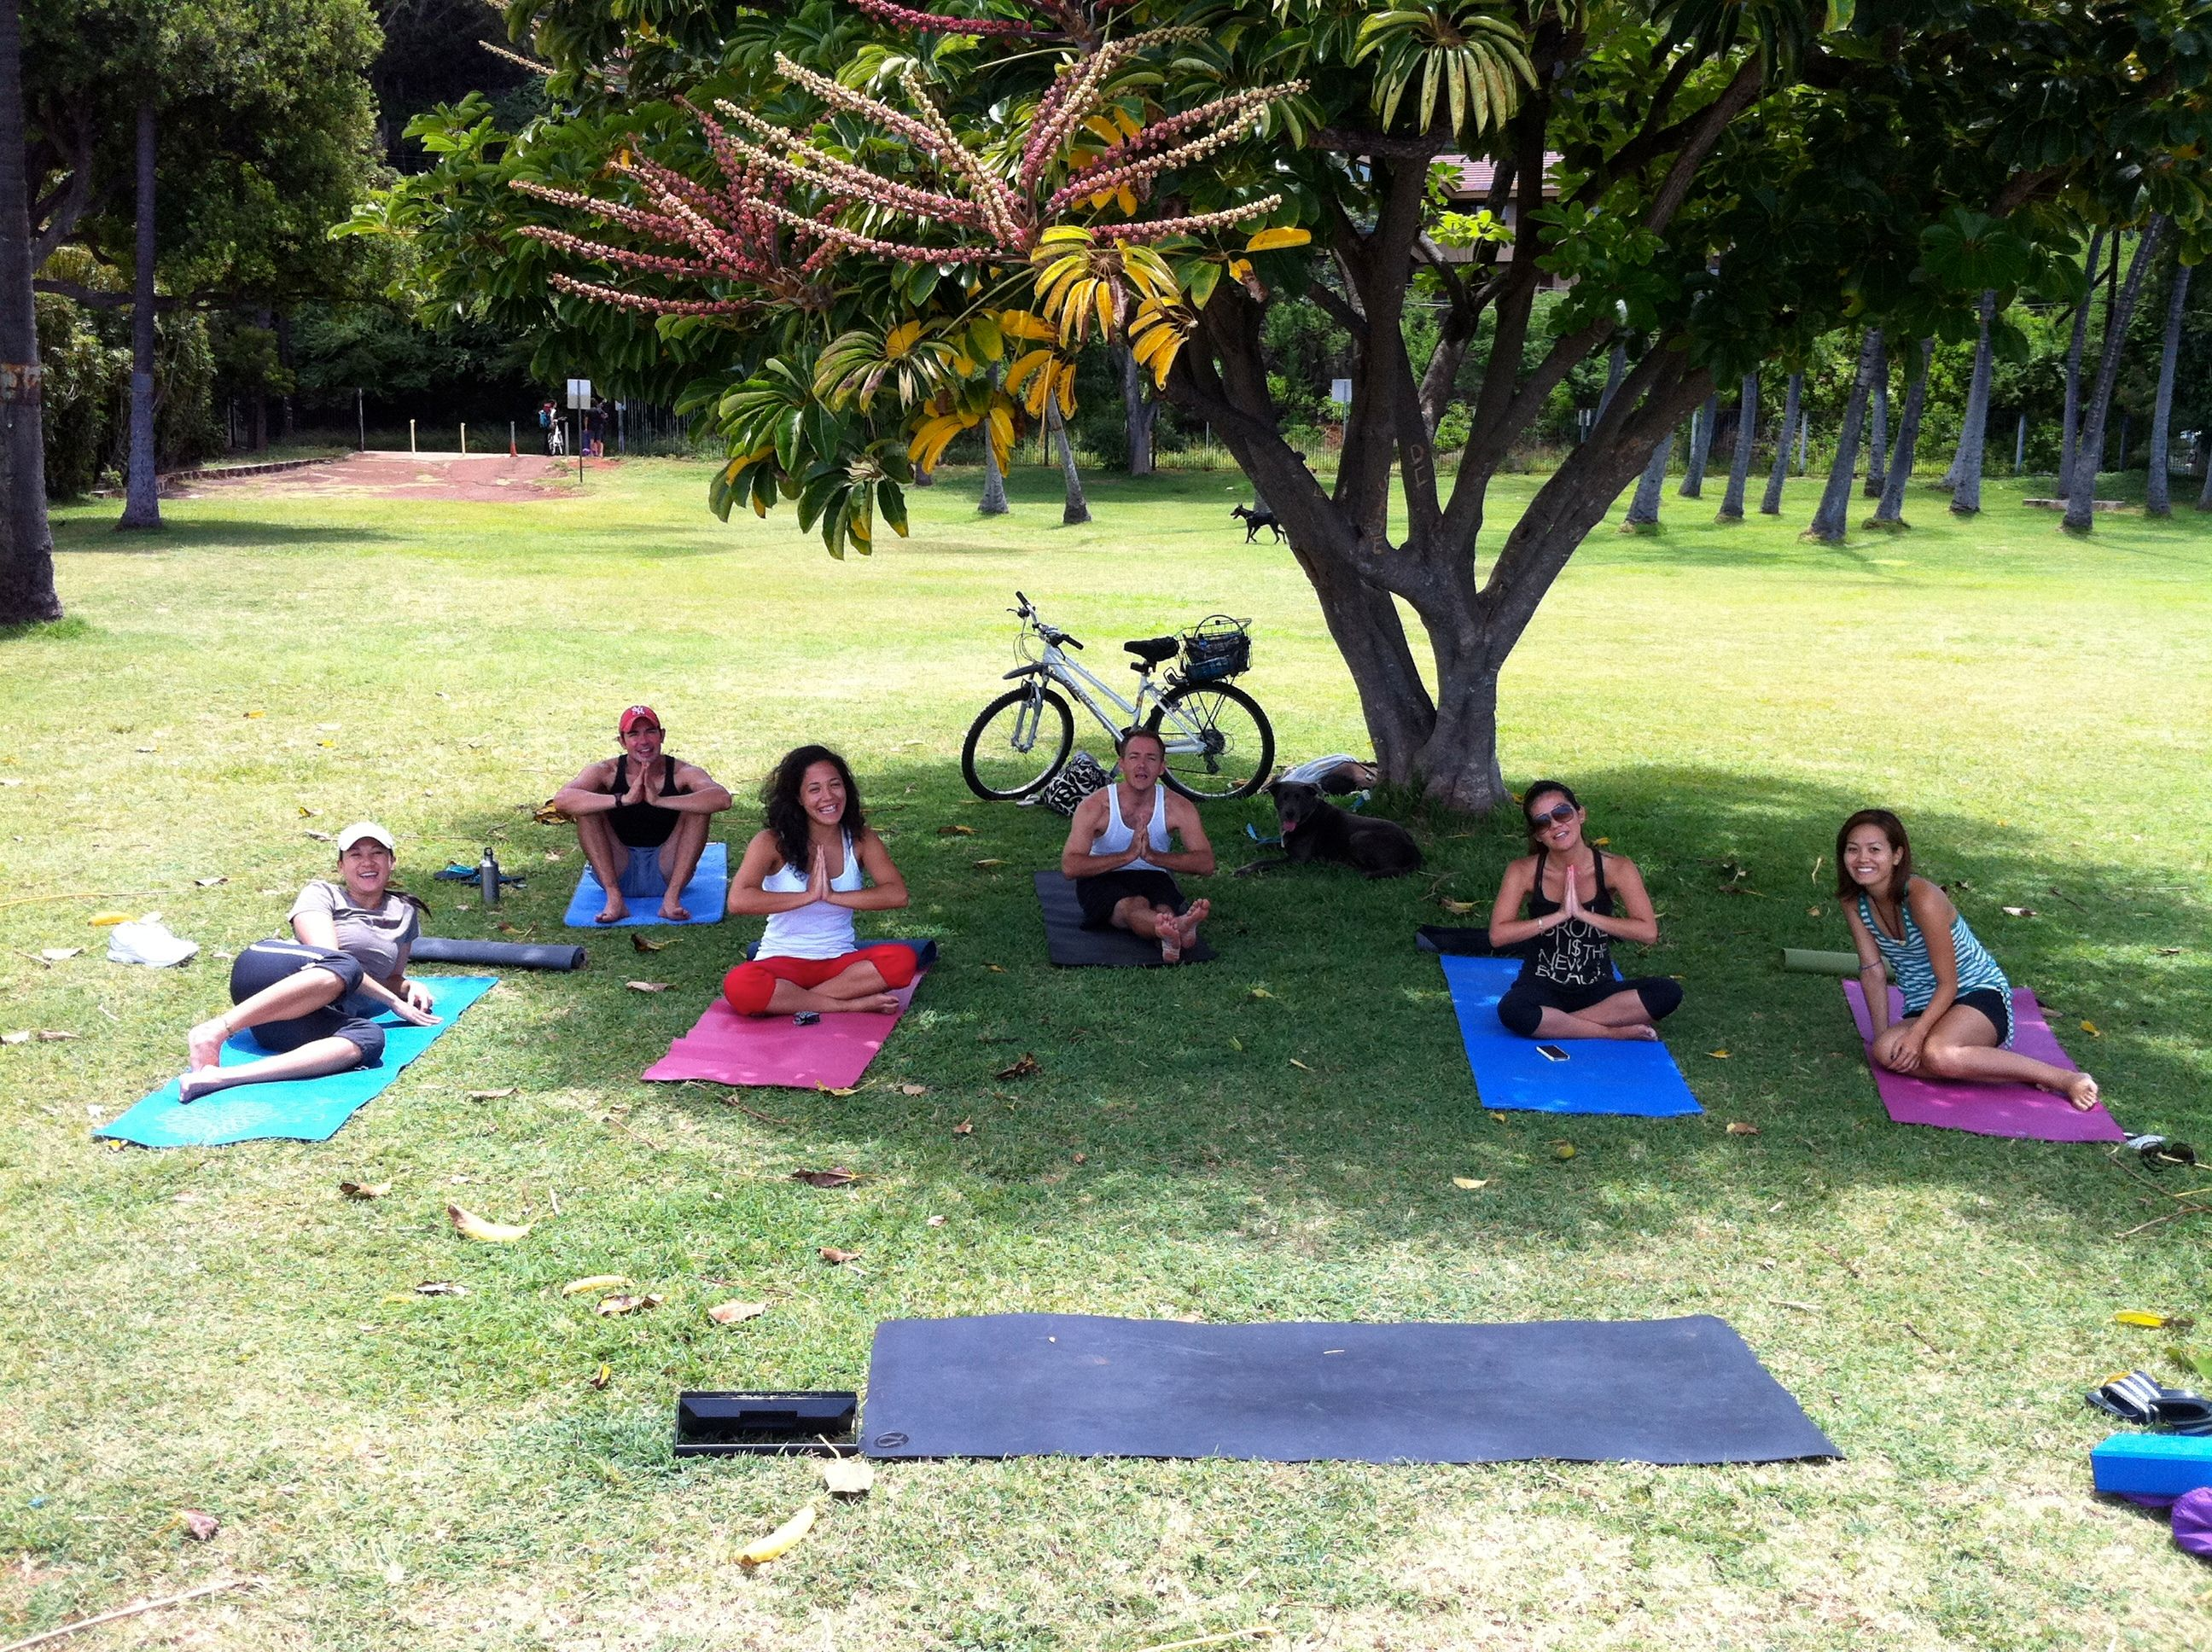 Yoga for My Homies